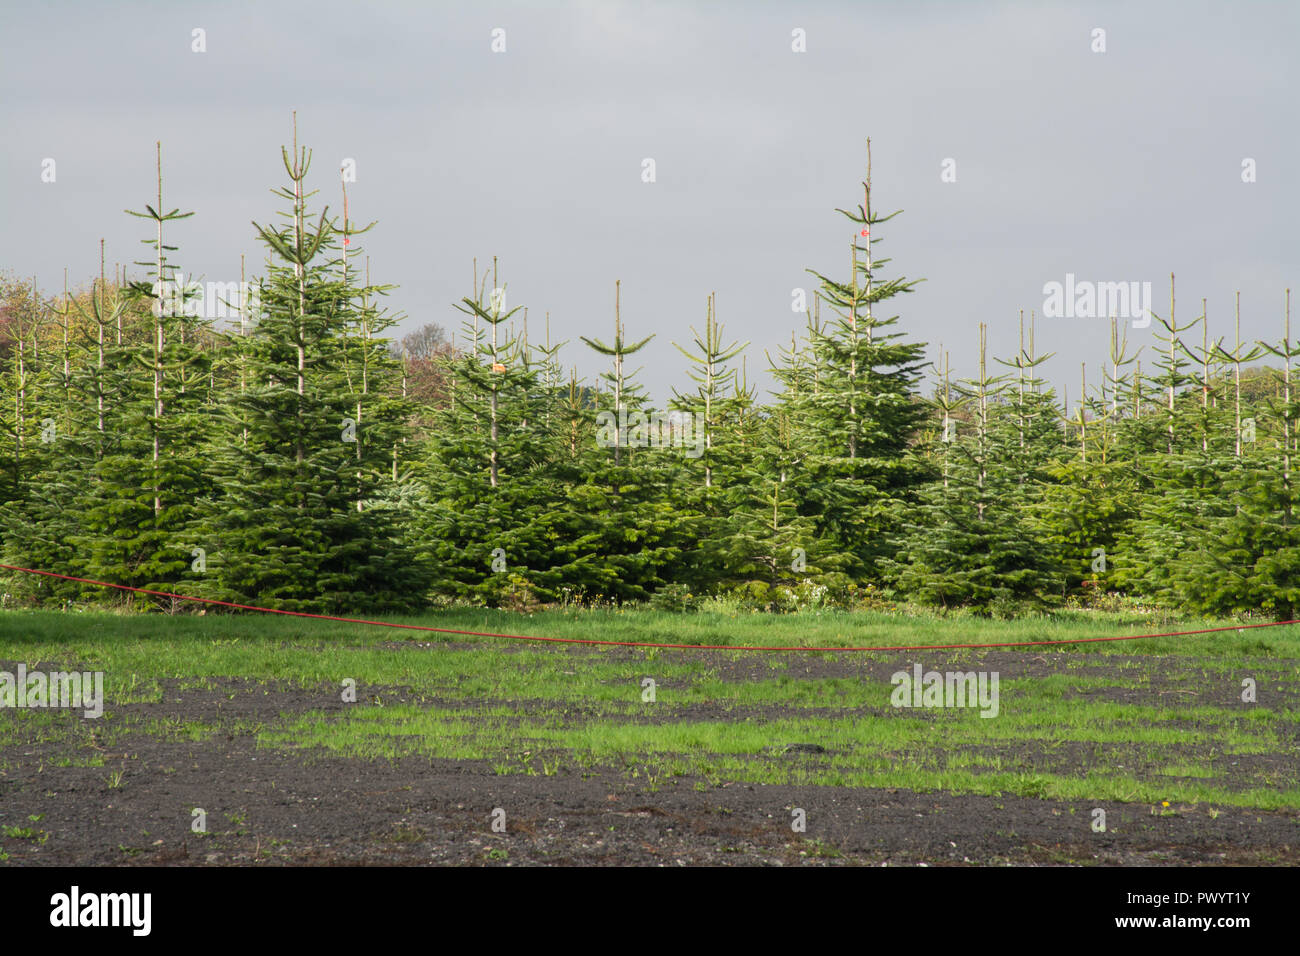 Growing Christmas Trees Uk Stock Photos & Growing